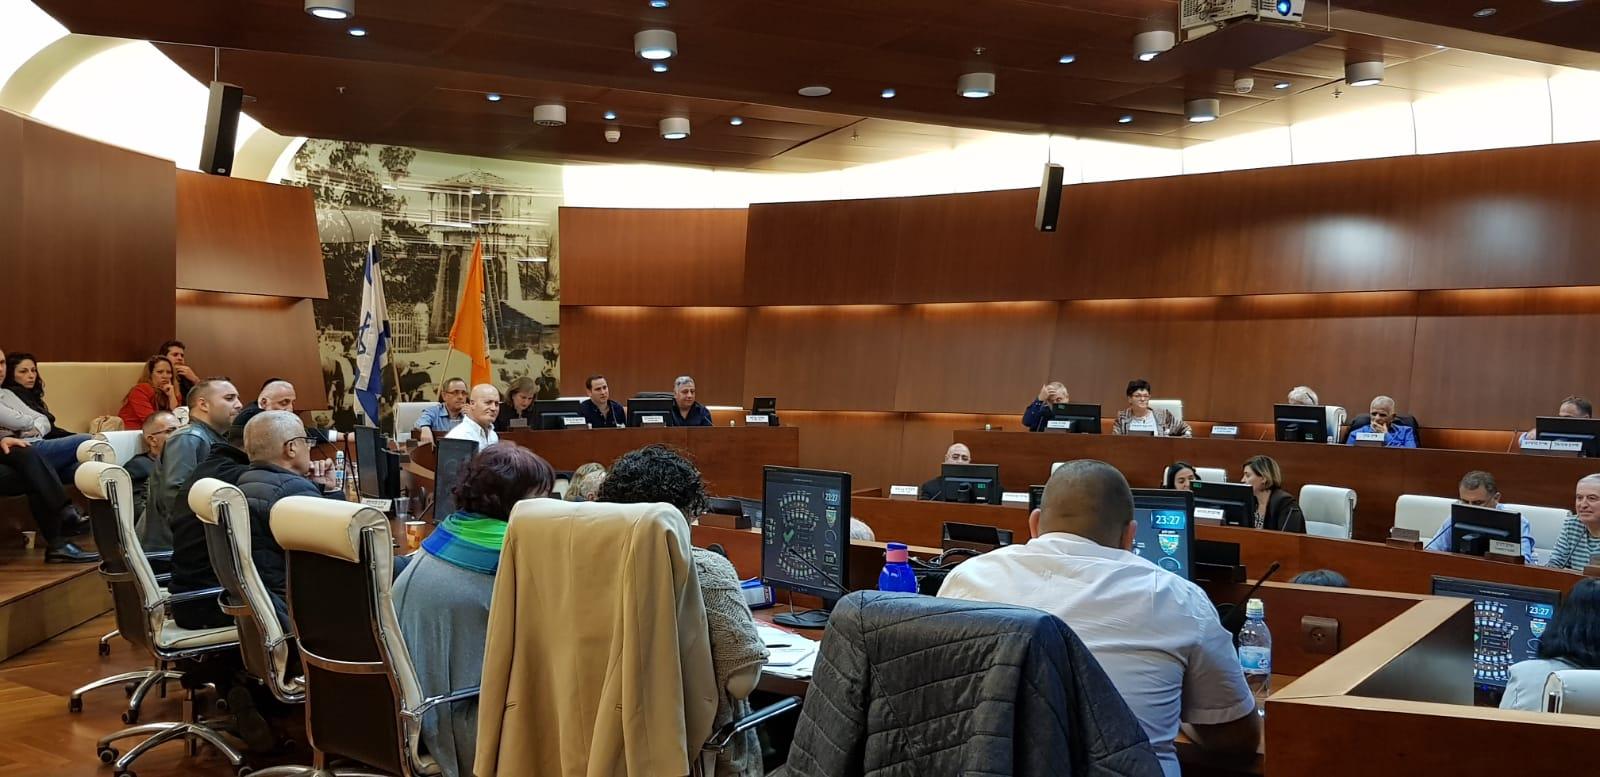 "Photo of ראשון לציון: אושר תקציב העירייה לשנת 2019. ראש העירייה, רז קינסטליך:""התקציב החדש מביא בשורה בתחום החינוך, הרווחה ובנושאים חשובים נוספים"""